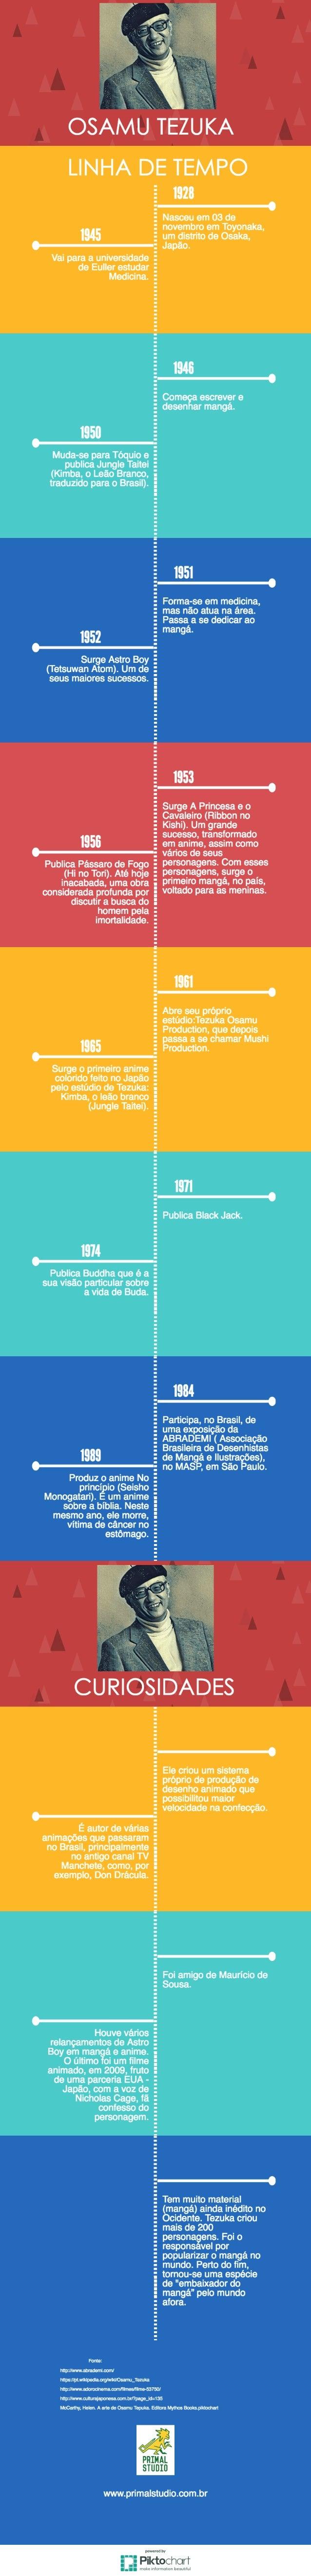 Infográfico sobre a vida de Osamu Tezuka